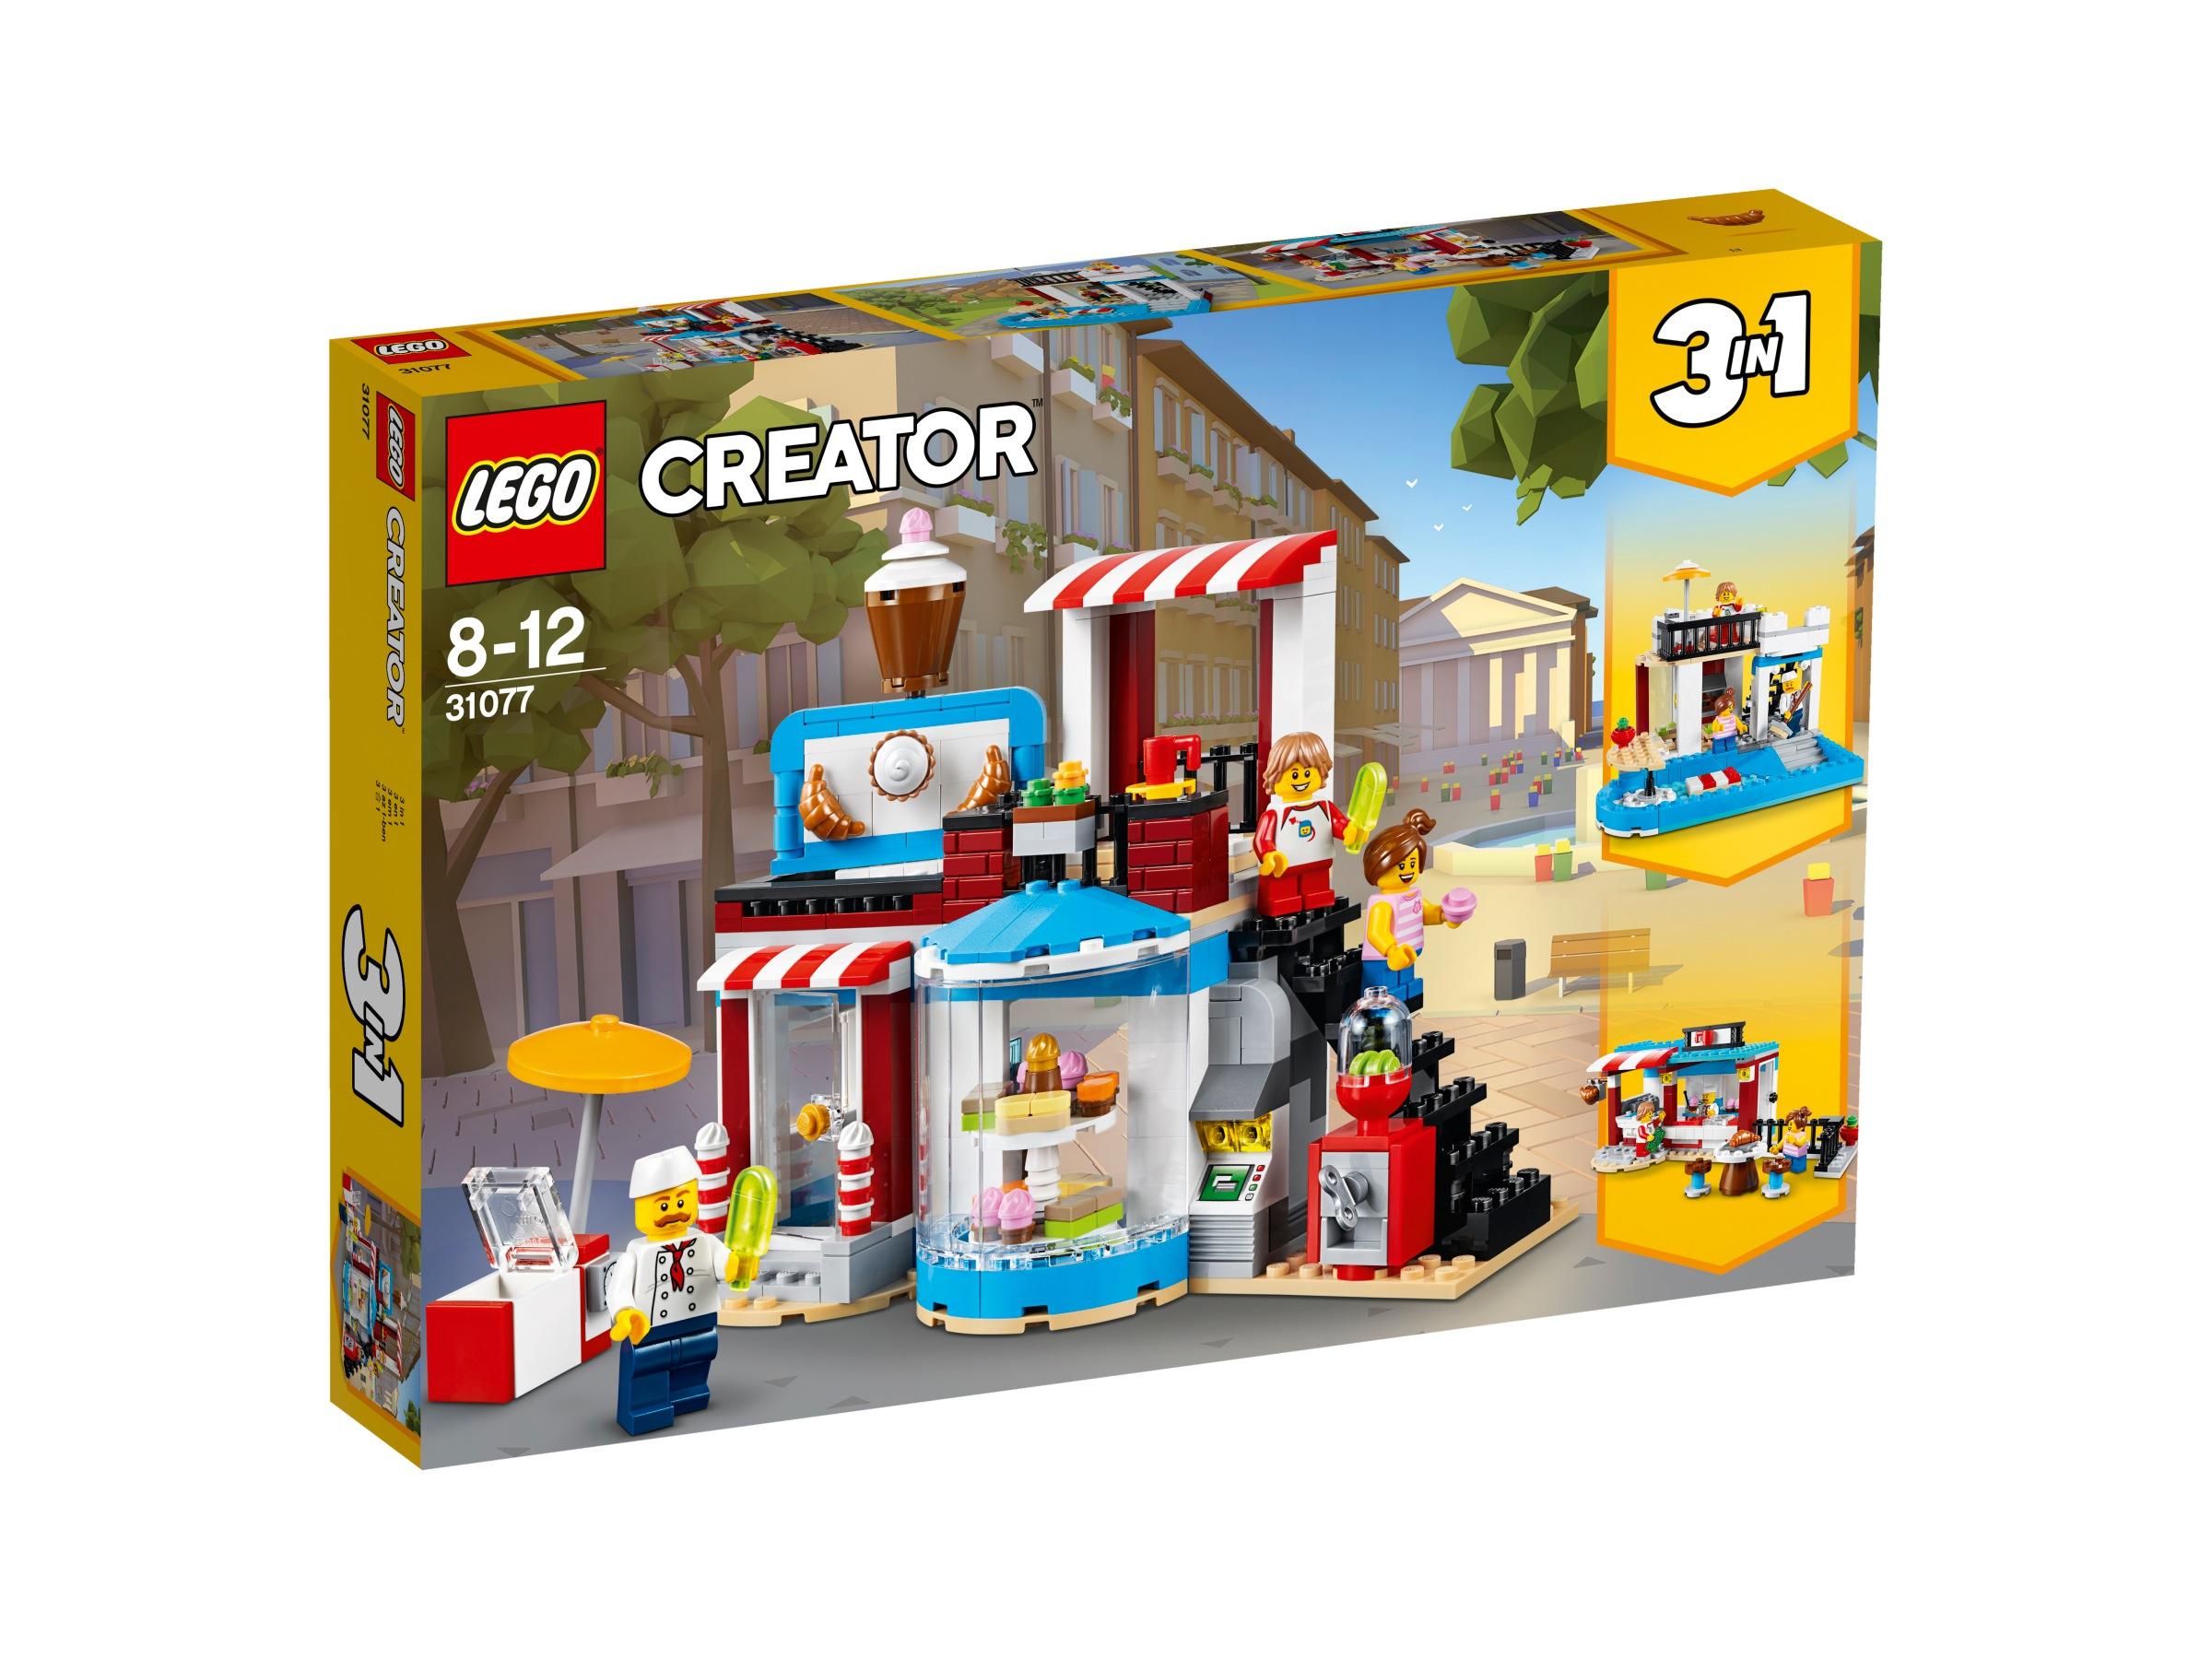 LEGO Creator Sladké prekvapenie 31077